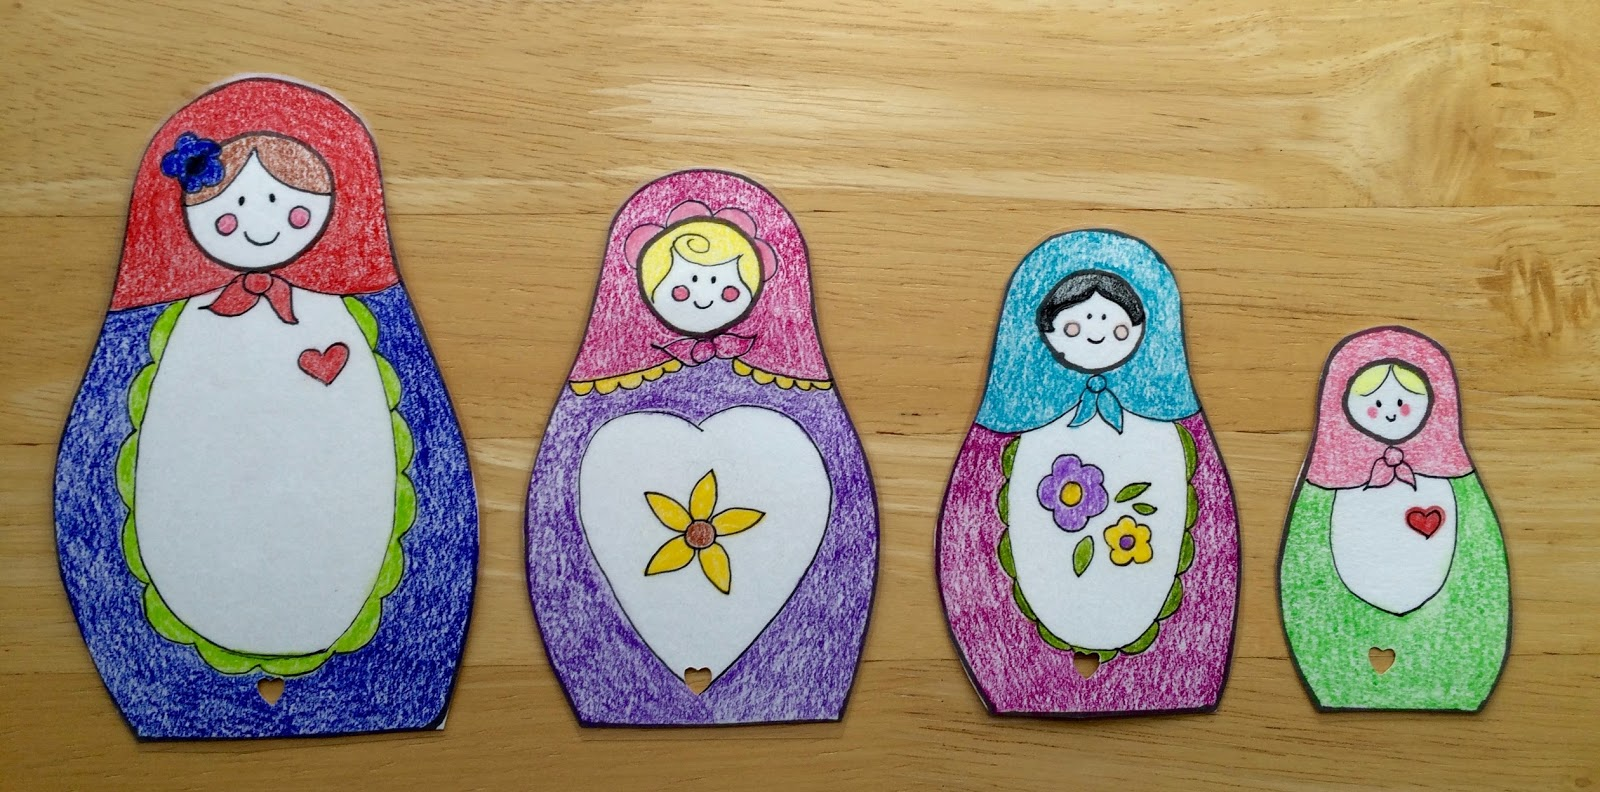 Kathy S Art Project Ideas Russian Matryoshka Art Lesson